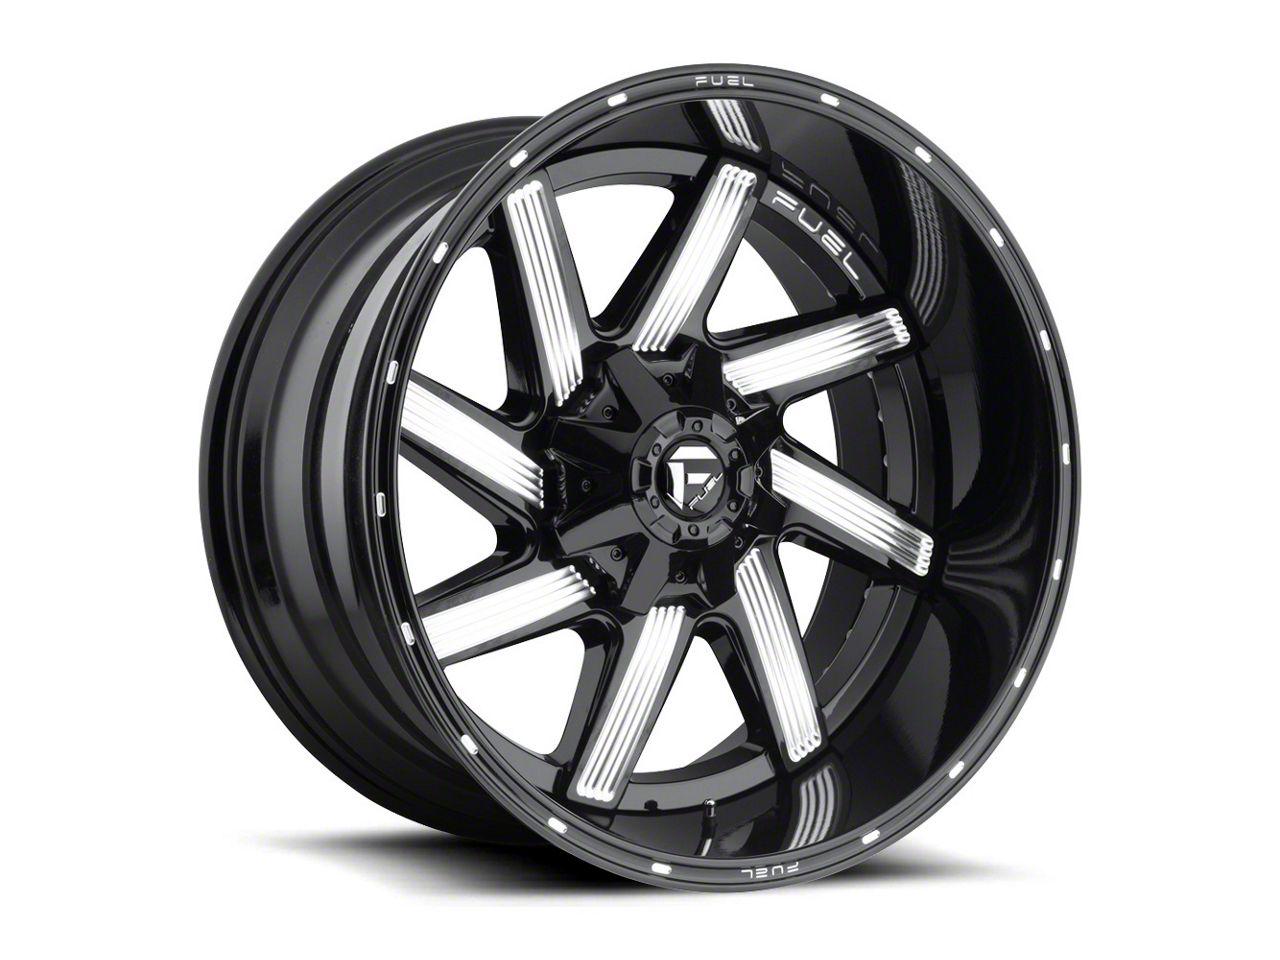 Fuel Wheels Moab Gloss Black Milled 6-Lug Wheel - 22x10 (07-18 Sierra 1500)